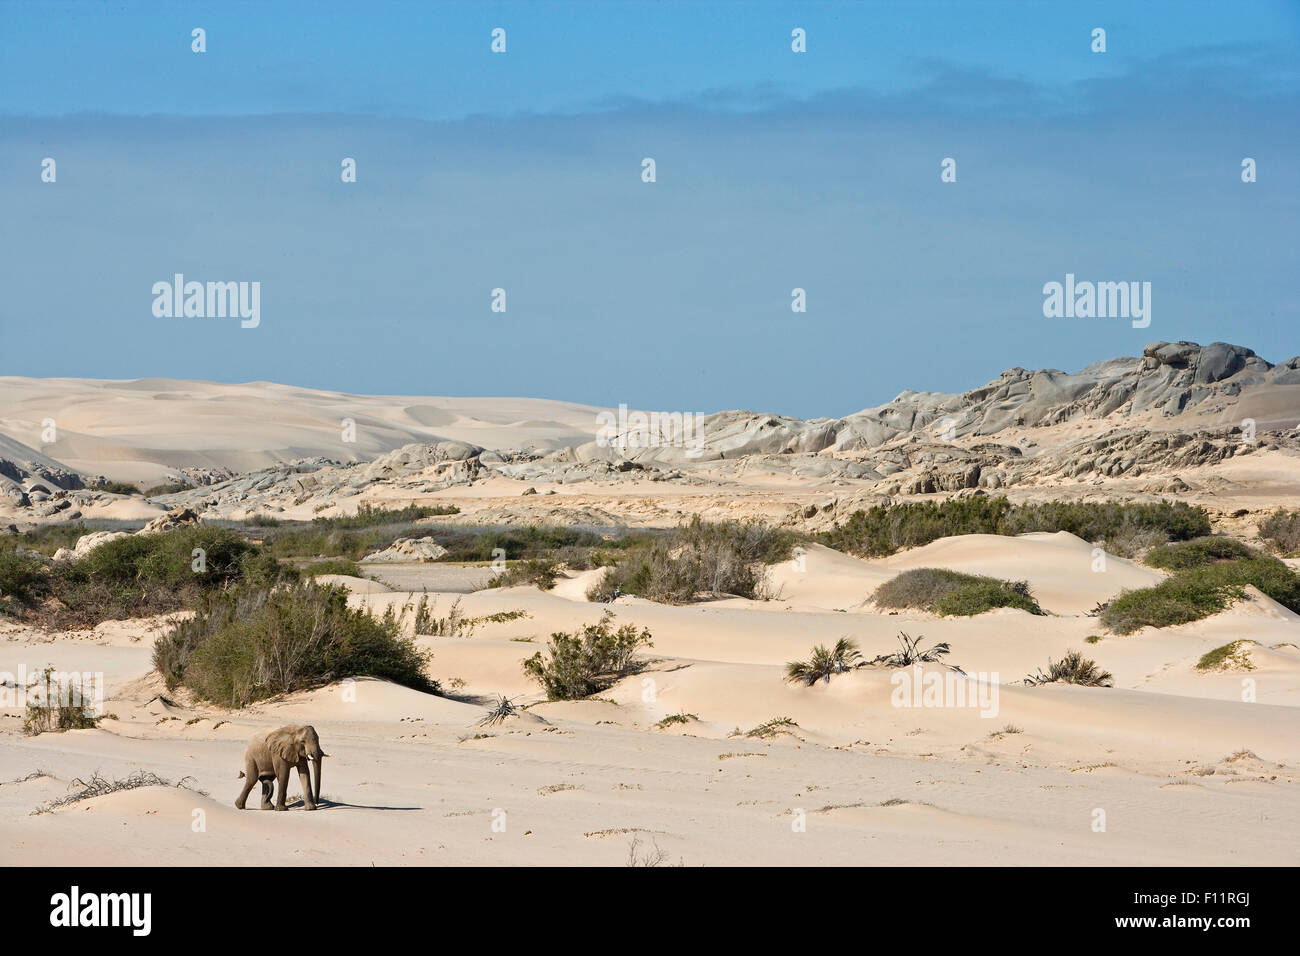 L'éléphant africain, l'éléphant du désert (Loxodonta africana africana) balades Photo Stock